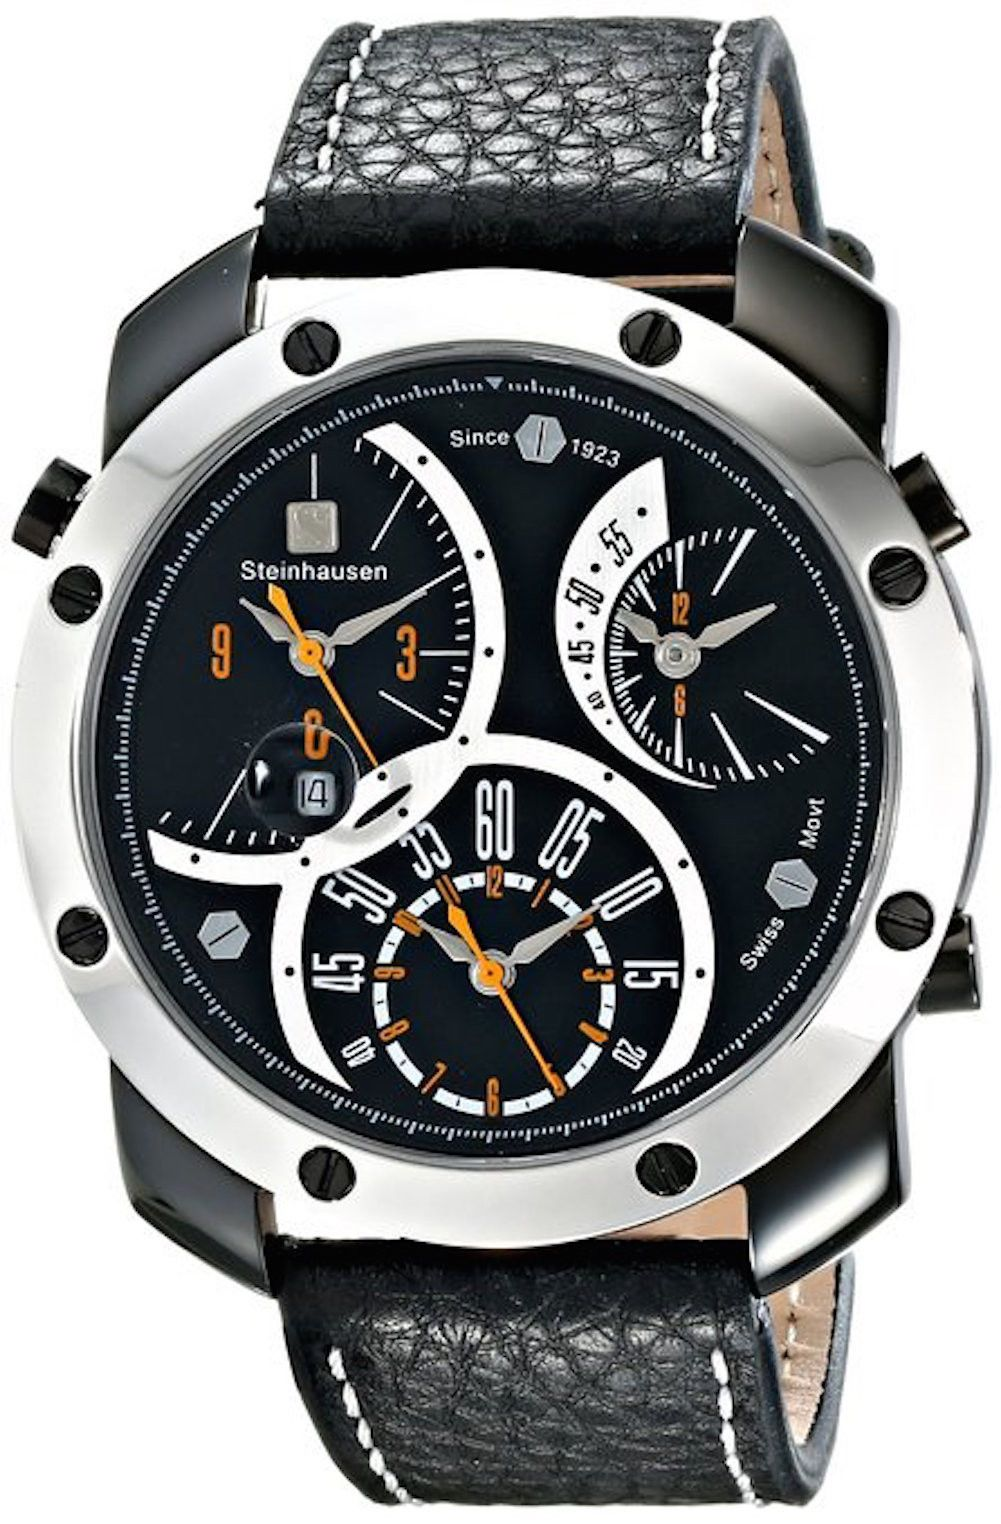 Steinhausen MW1306LSLSORL Men's Watch Triple Time Zone Black Dial